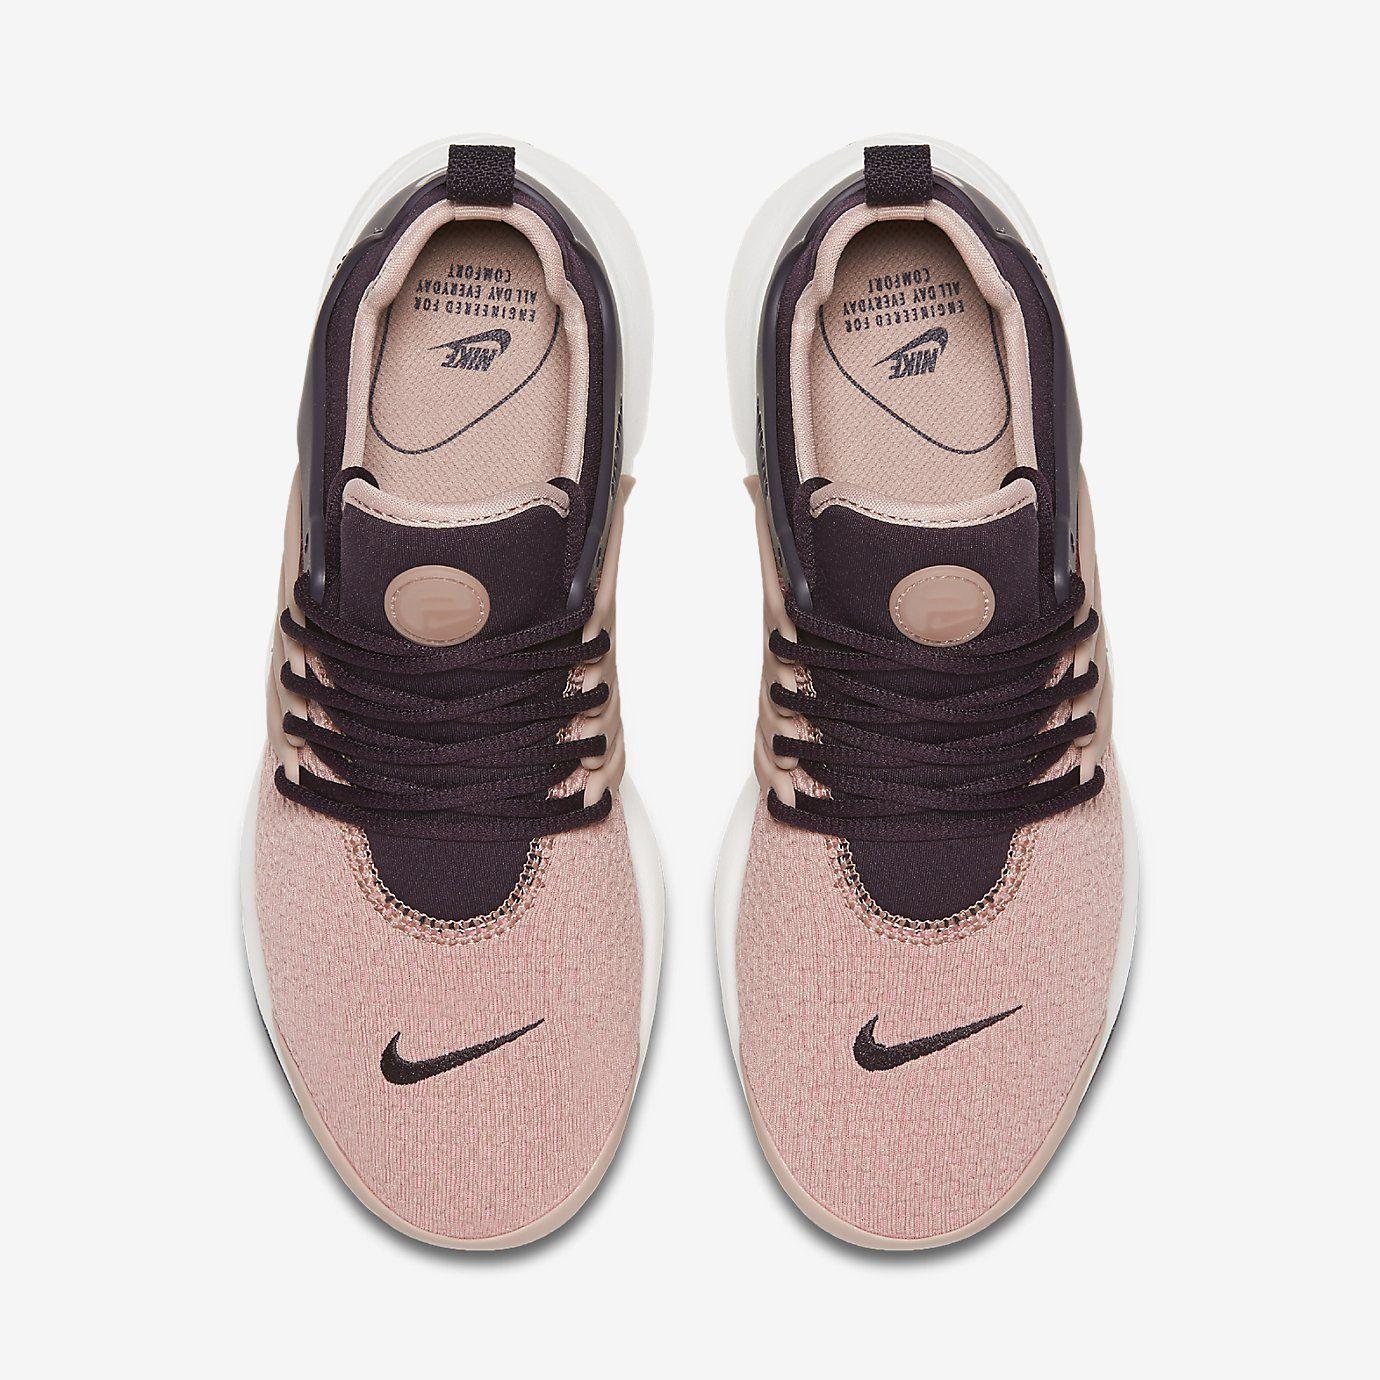 Nike air presto woman, Sneaker outfits